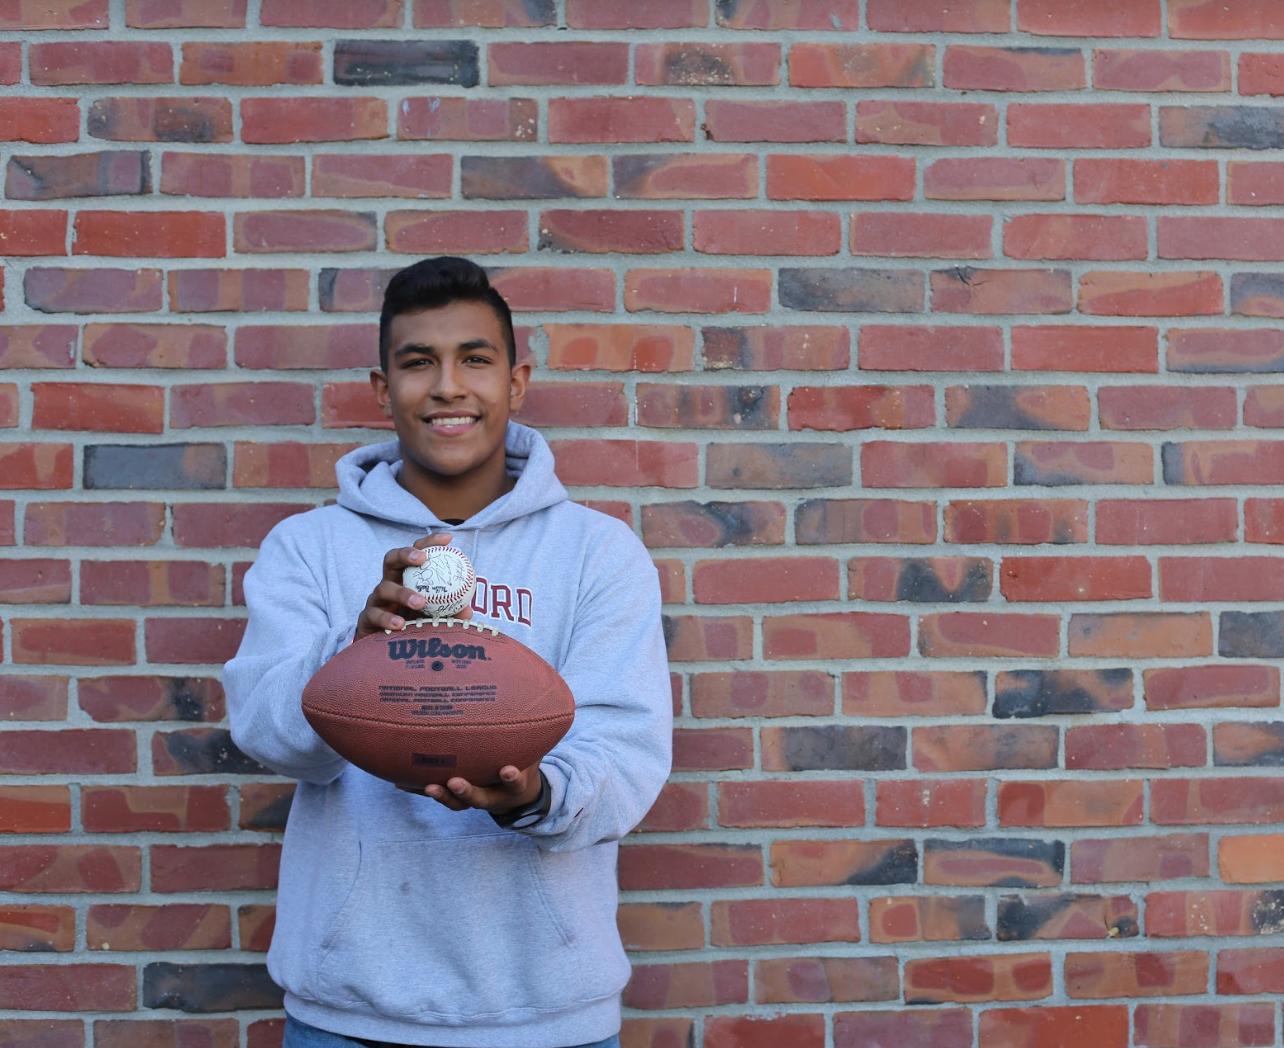 Junior Jonathan Leslie plays football and baseball at Lynbrook. His favorite quote is: